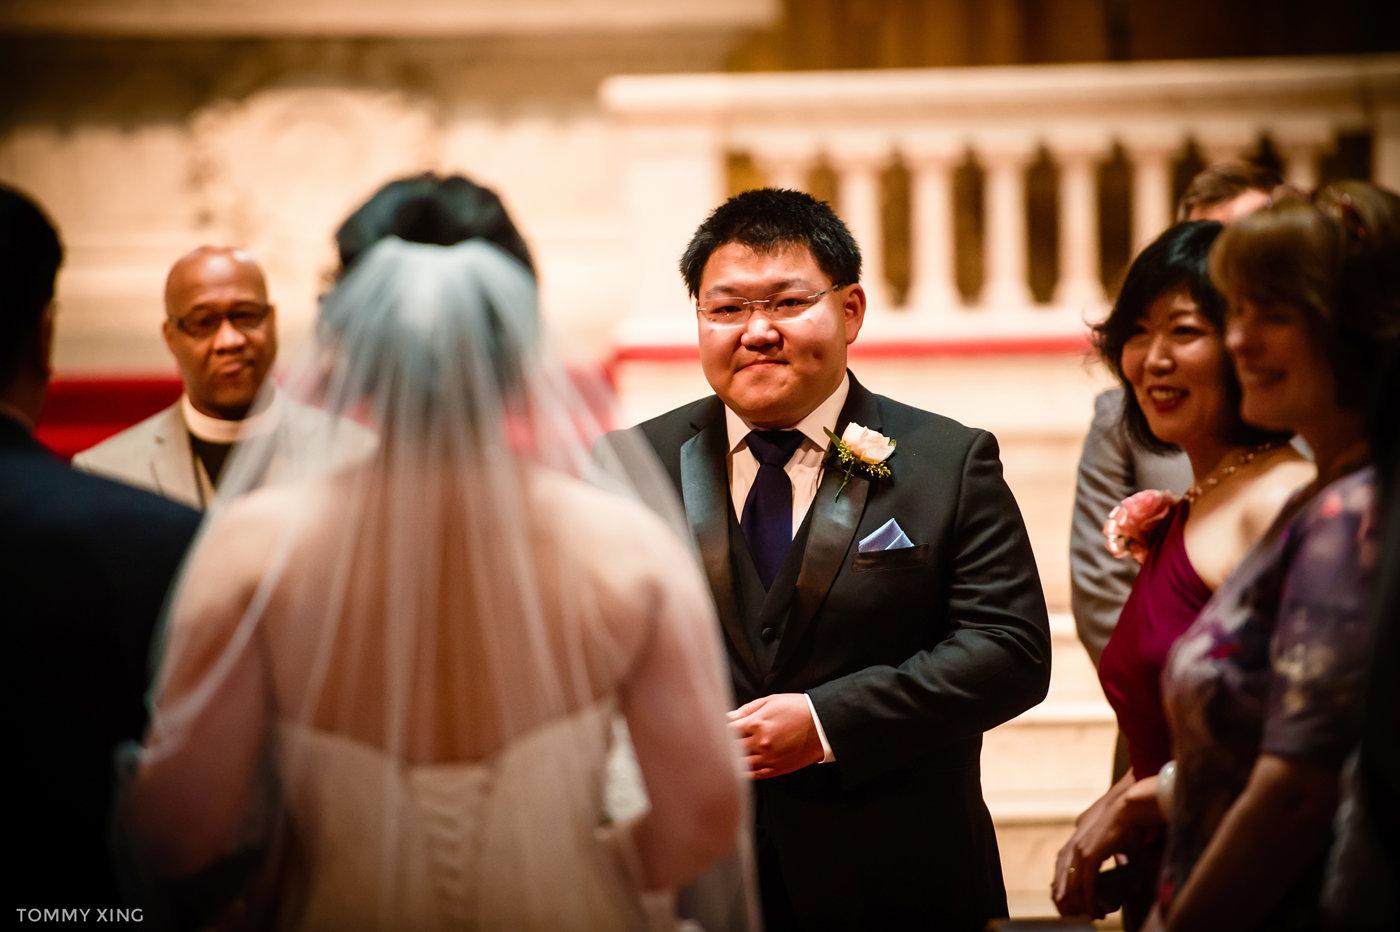 STANFORD MEMORIAL CHURCH WEDDING - Wenjie & Chengcheng - SAN FRANCISCO BAY AREA 斯坦福教堂婚礼跟拍 - 洛杉矶婚礼婚纱照摄影师 Tommy Xing Photography079.jpg